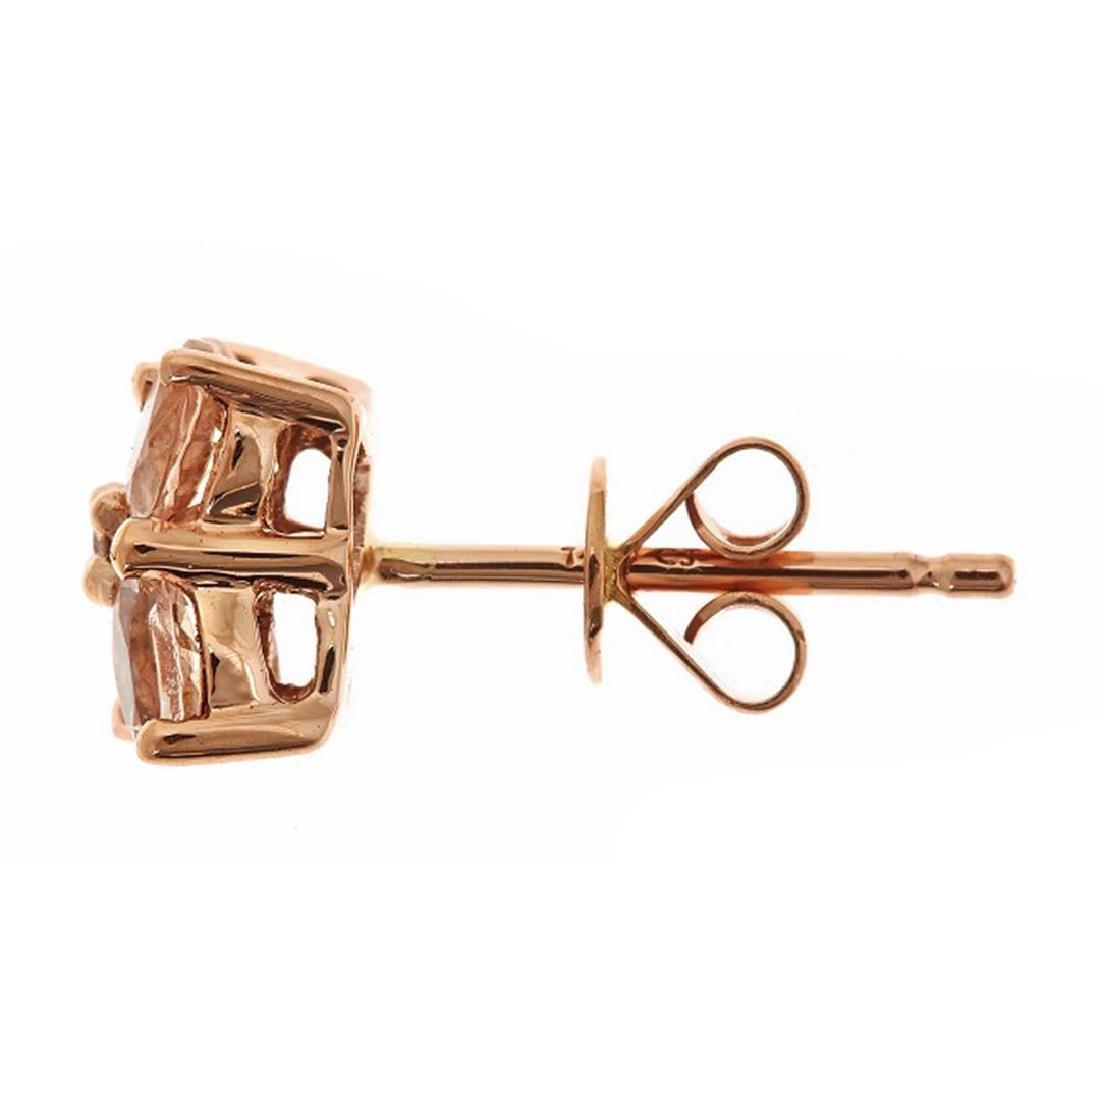 1.45 ctw Morganite and Diamond Earrings - 14KT Rose - 2